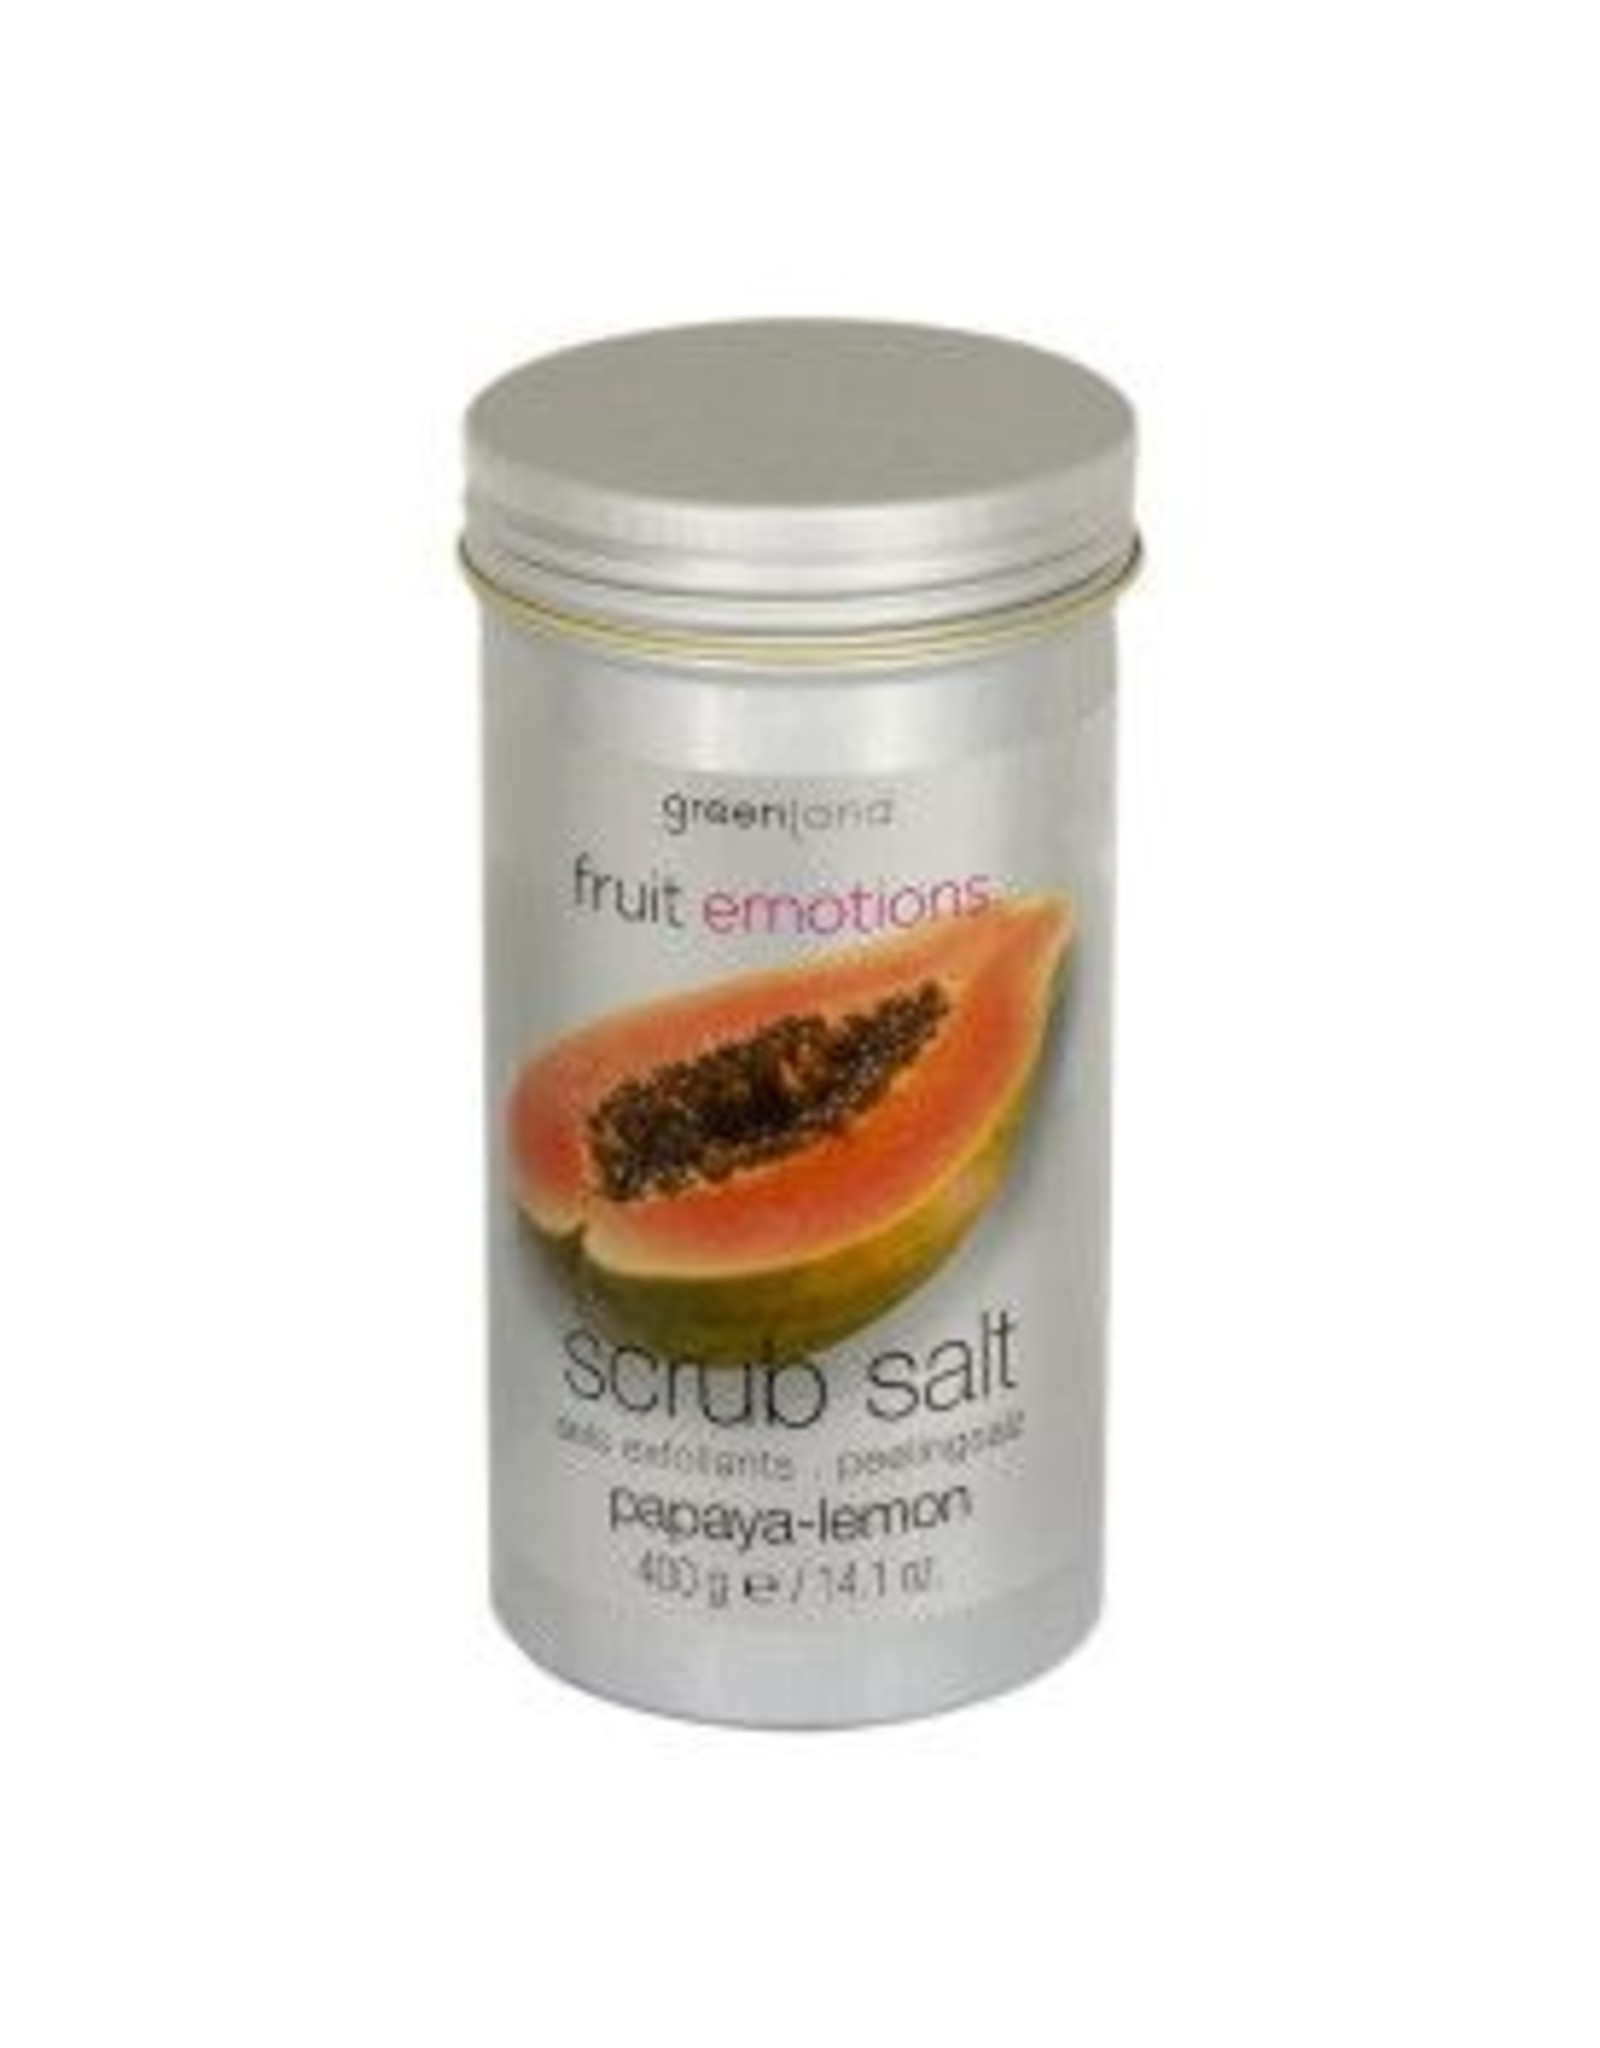 GreenLand Scrub Salt  Papaya Lemon 400g  - Body & Soap